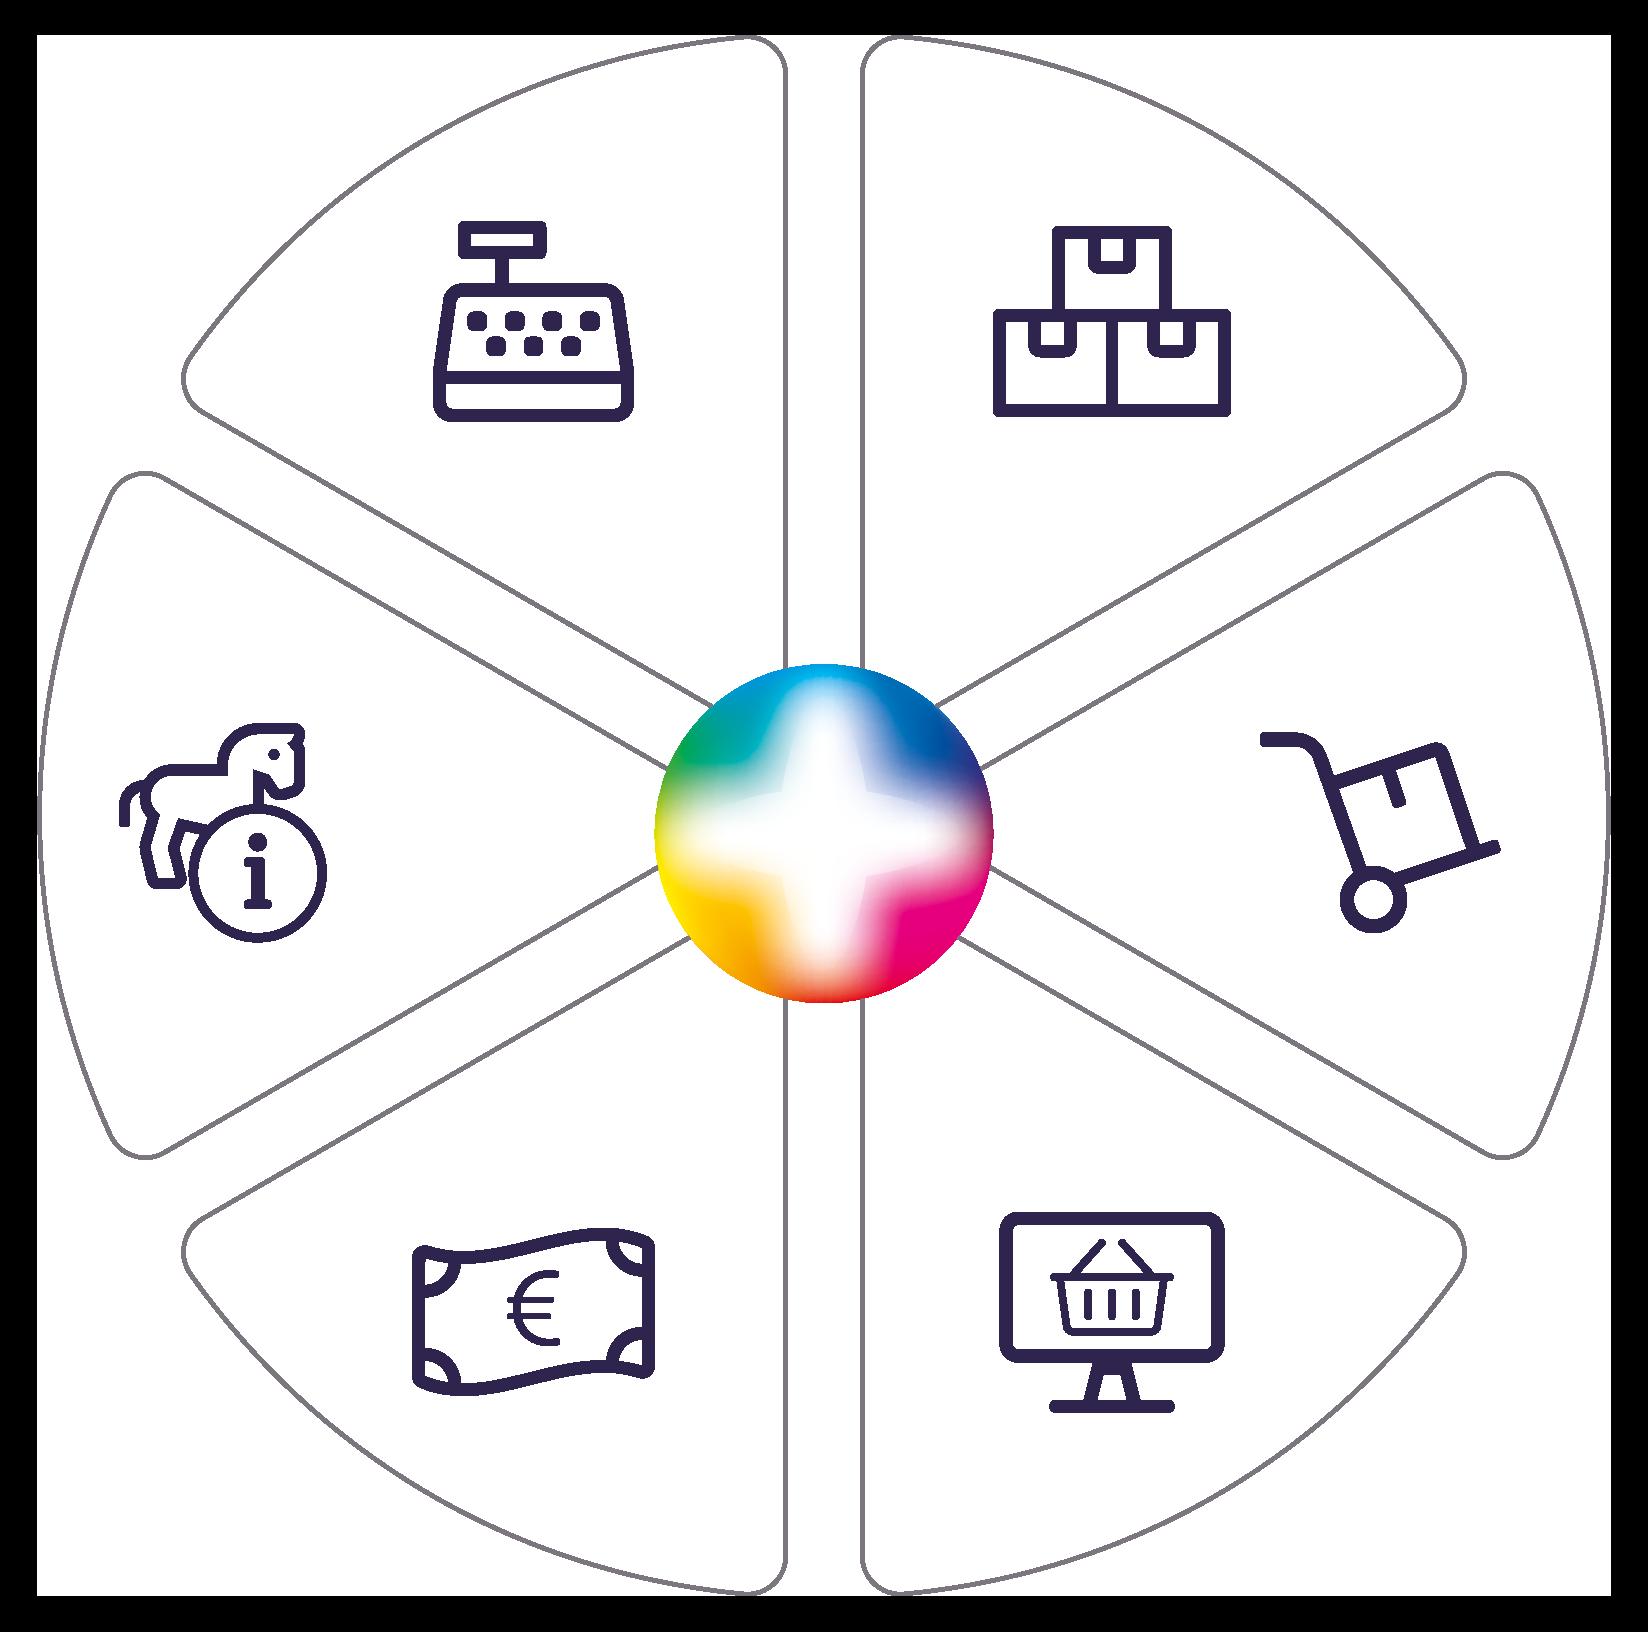 ERP systeem en bedrijfssoftware